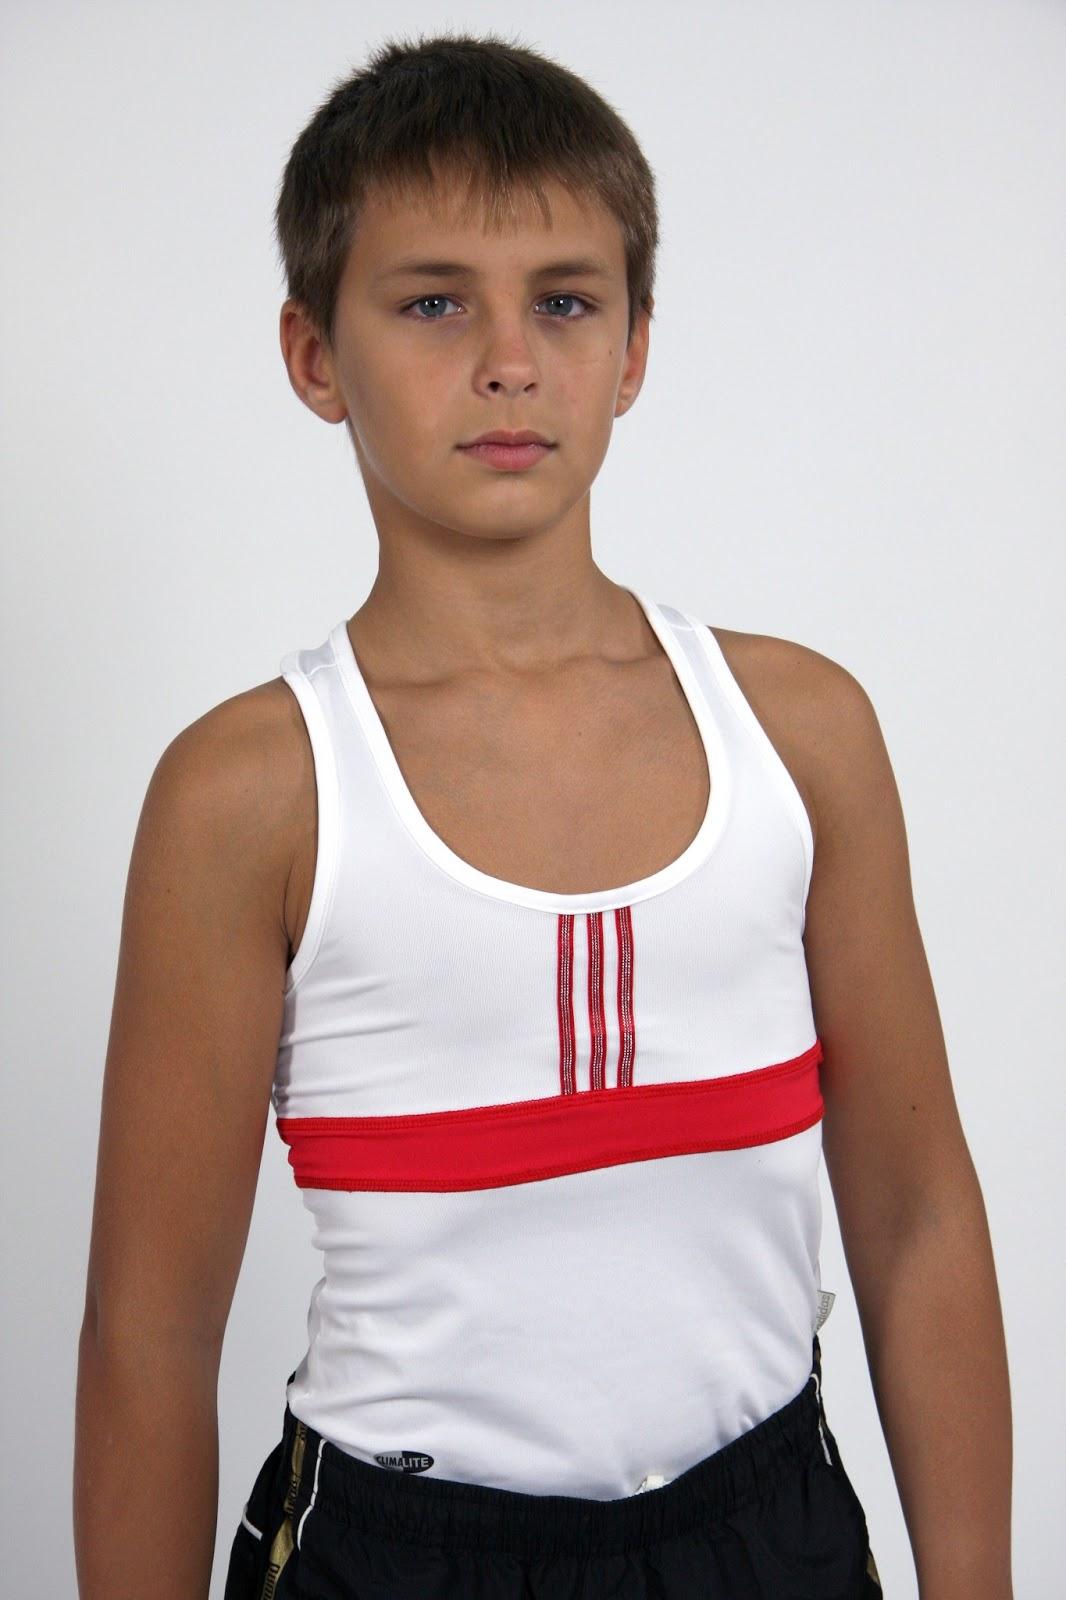 Andrei Boy Model CD 1